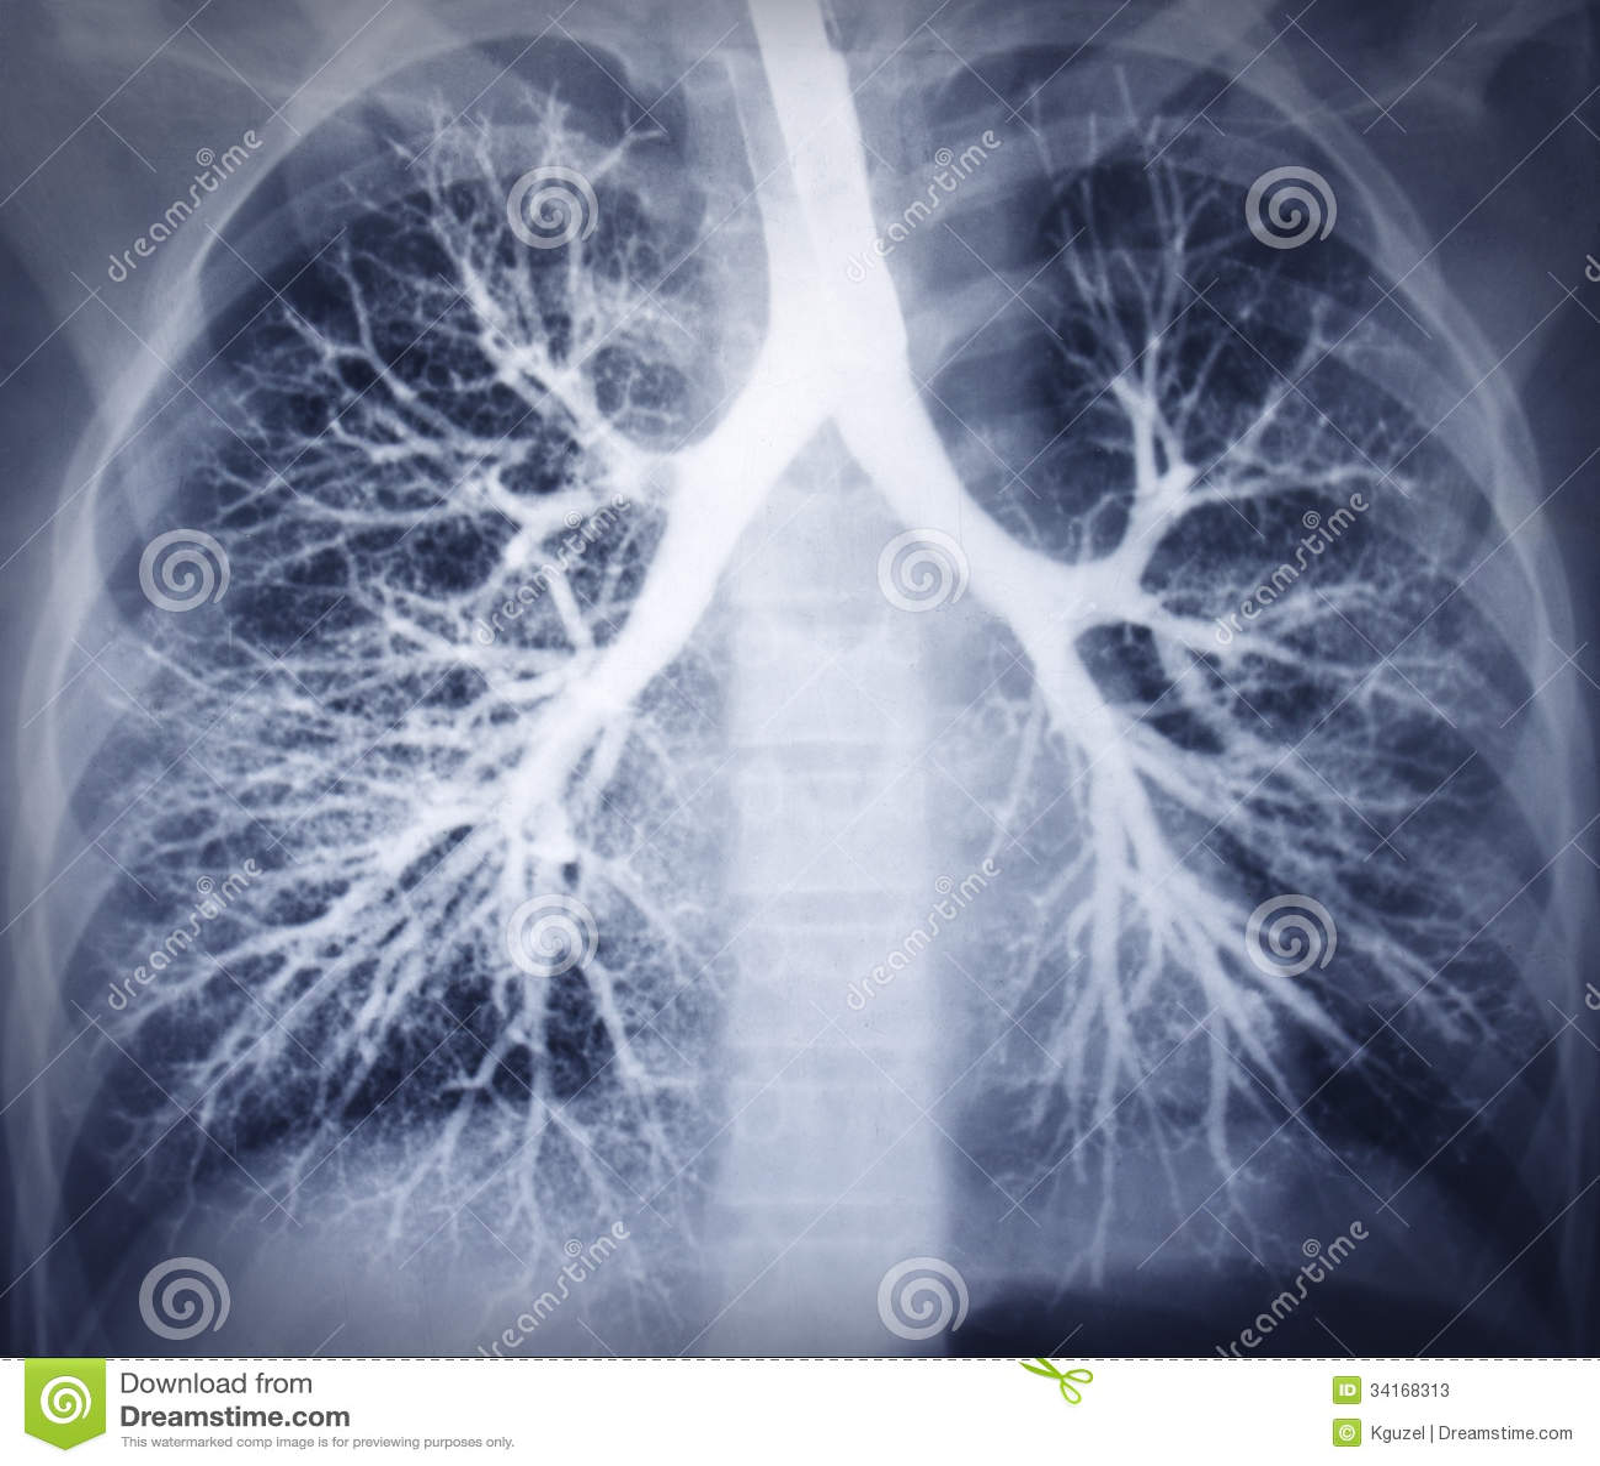 Bronchoscopybild. Brustradiographie. Gesunde Lungen